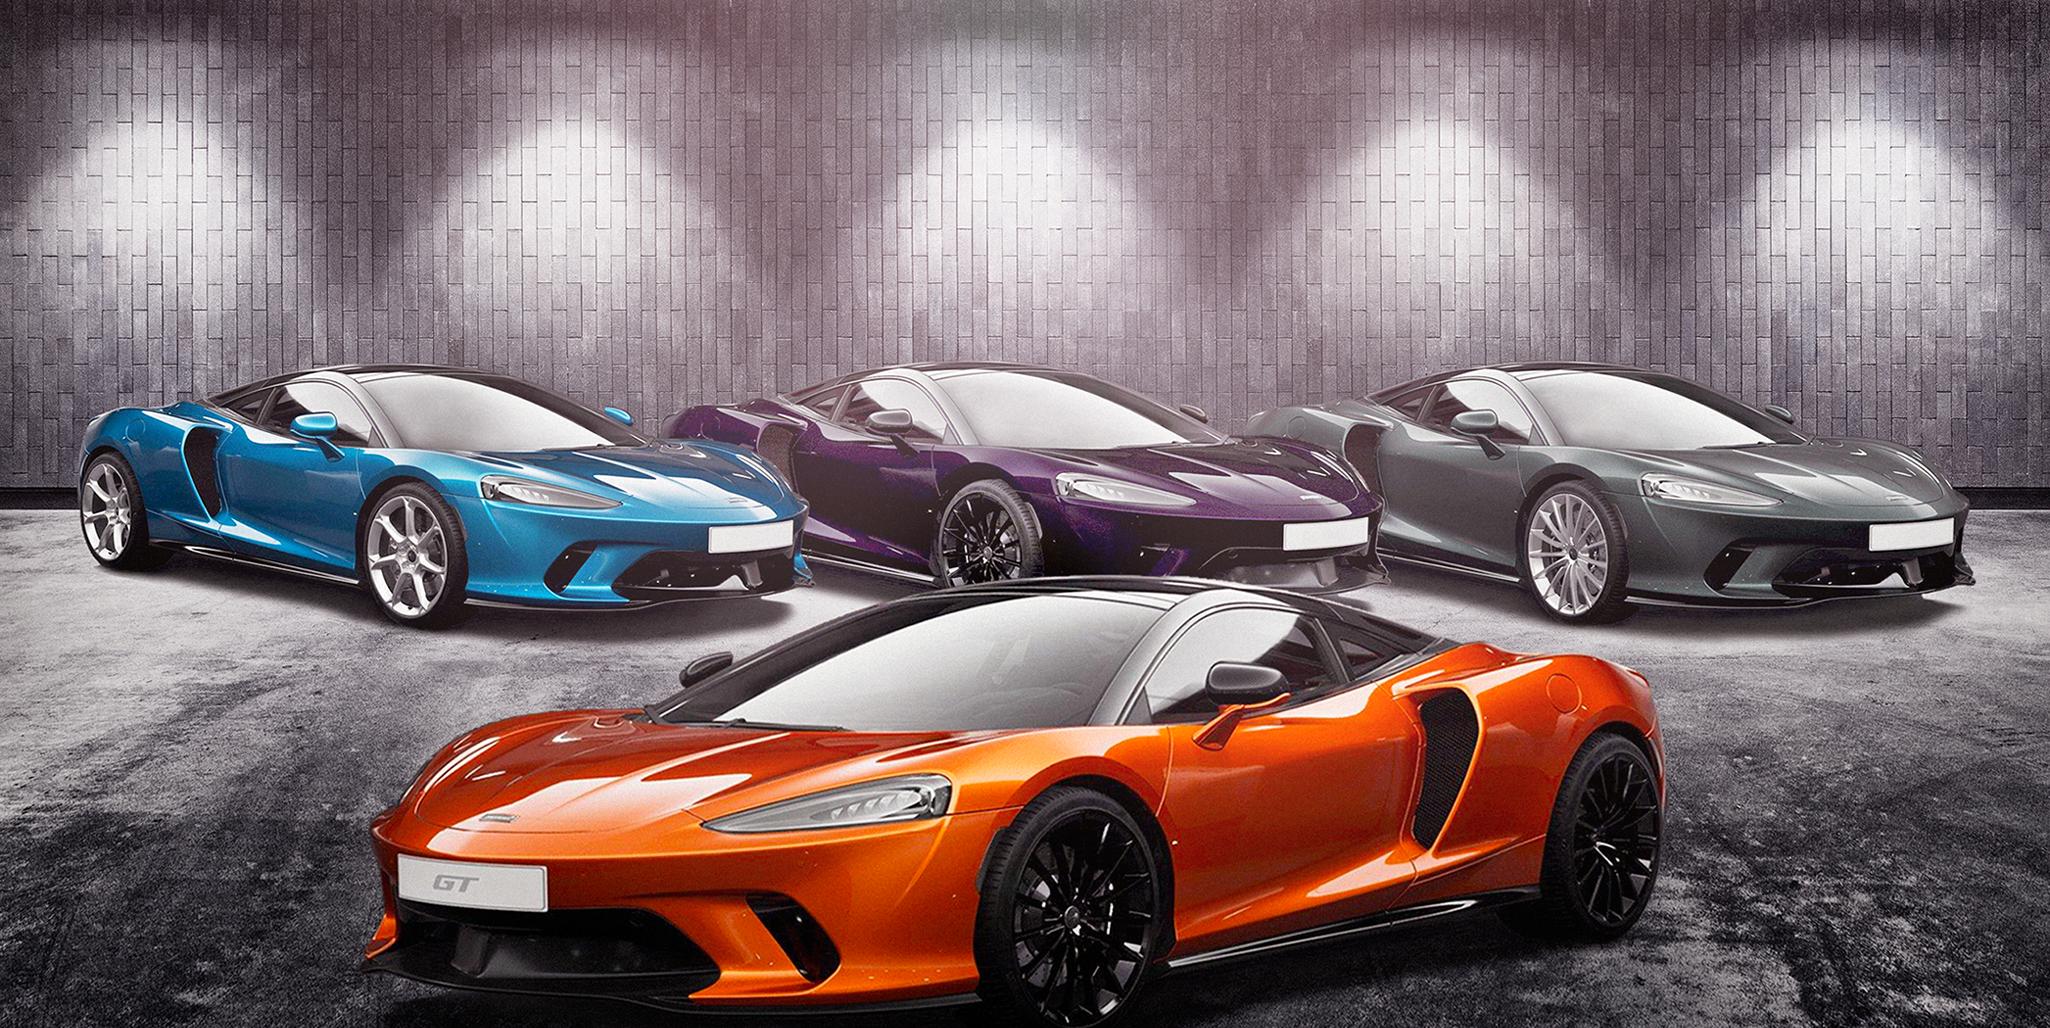 The 2020 McLaren GT Car and Driver Editors Want